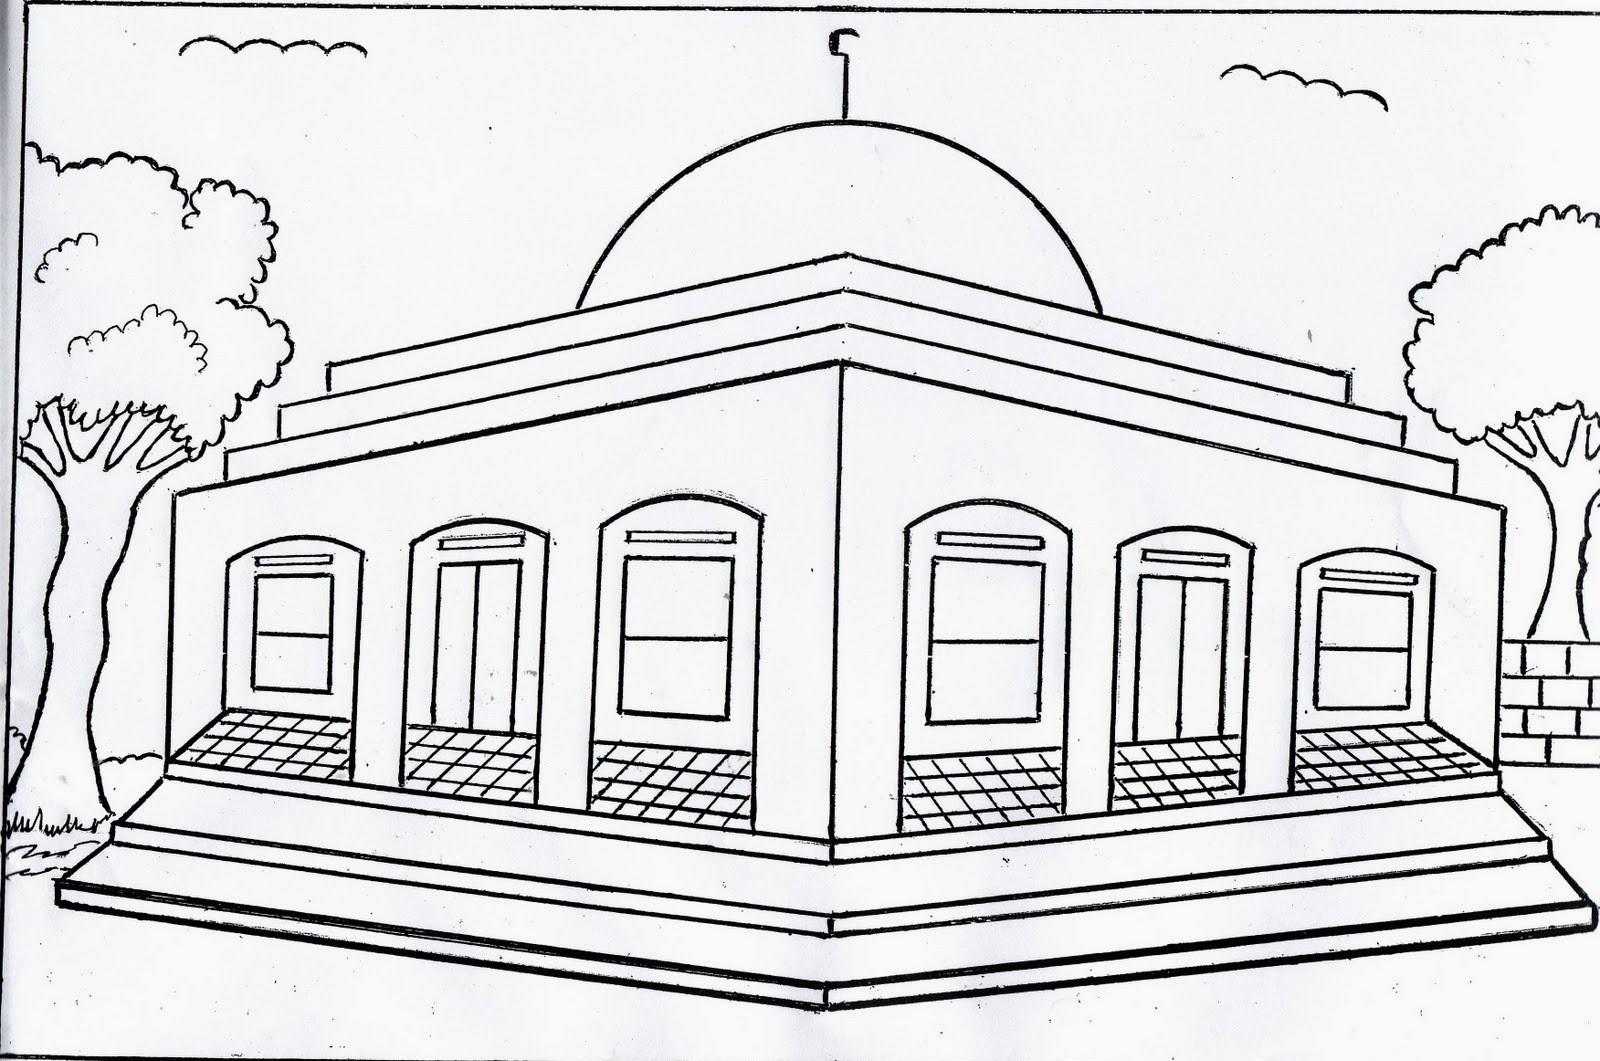 Gambar Mewarnai Islami Anak Tk Dan Sd Terbaru 2019